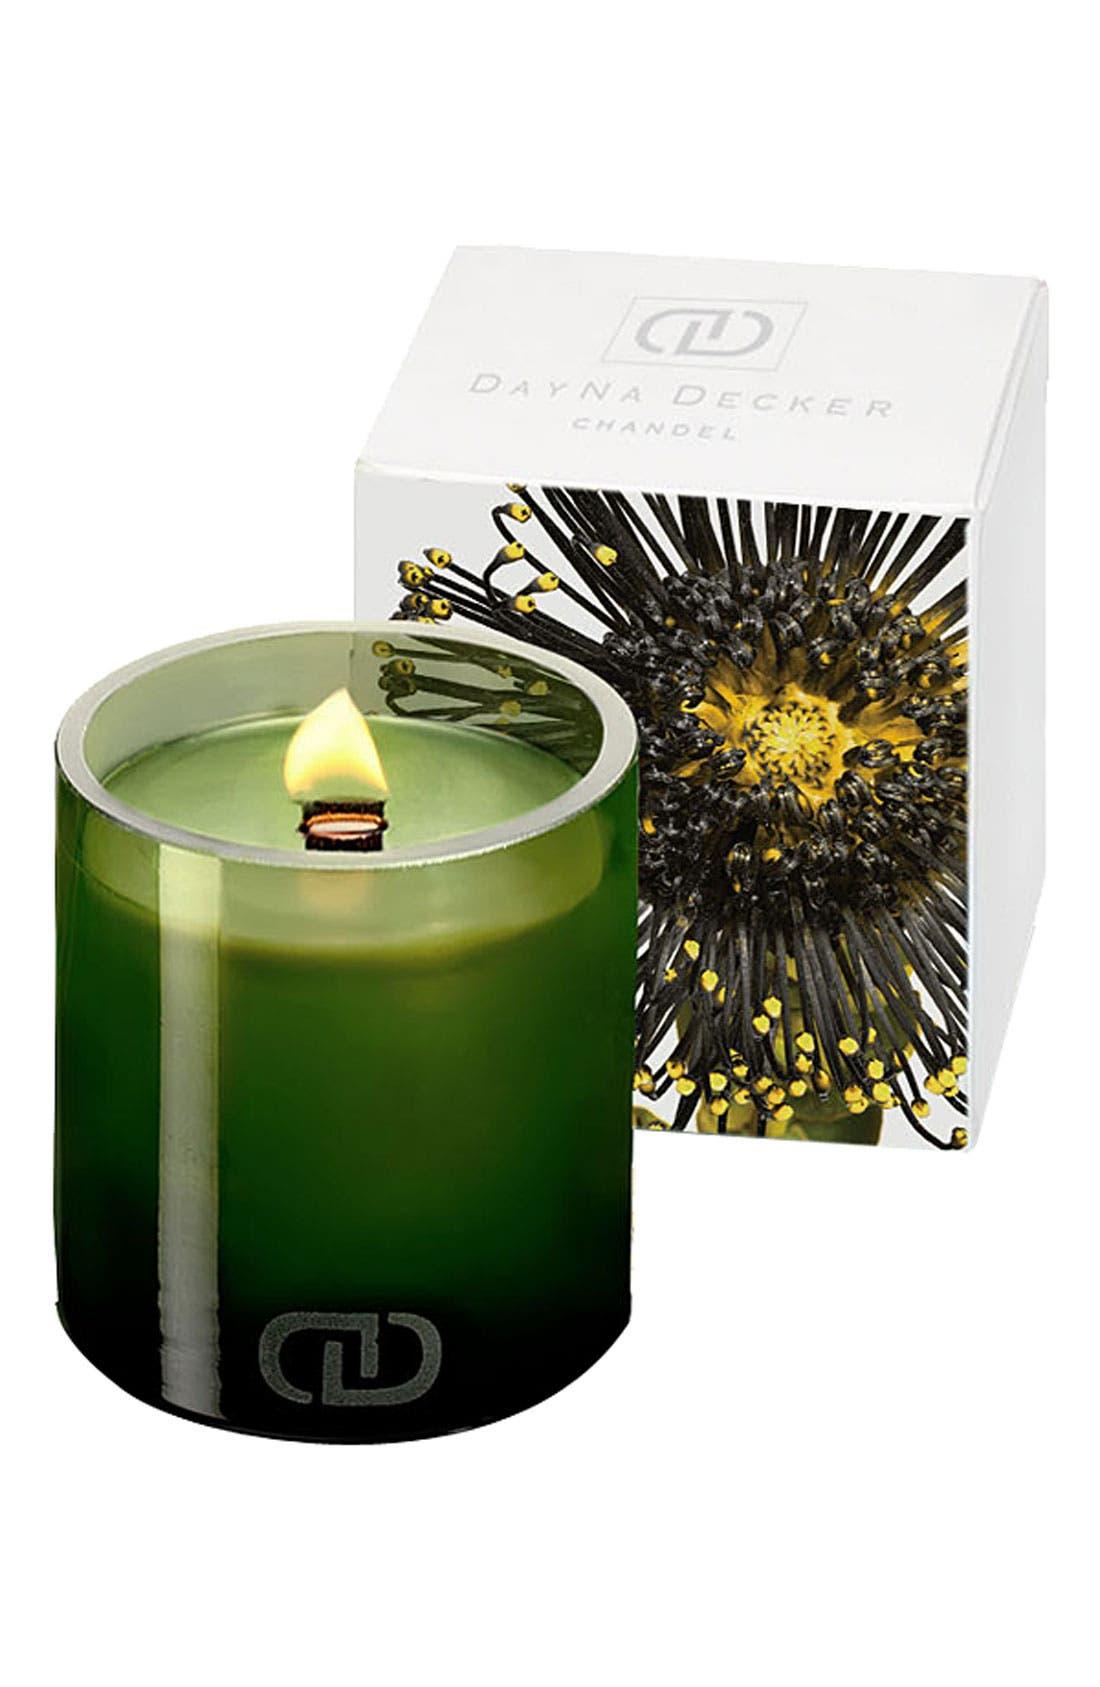 Main Image - DayNa Decker® 'Taiga' Chandel® Candle